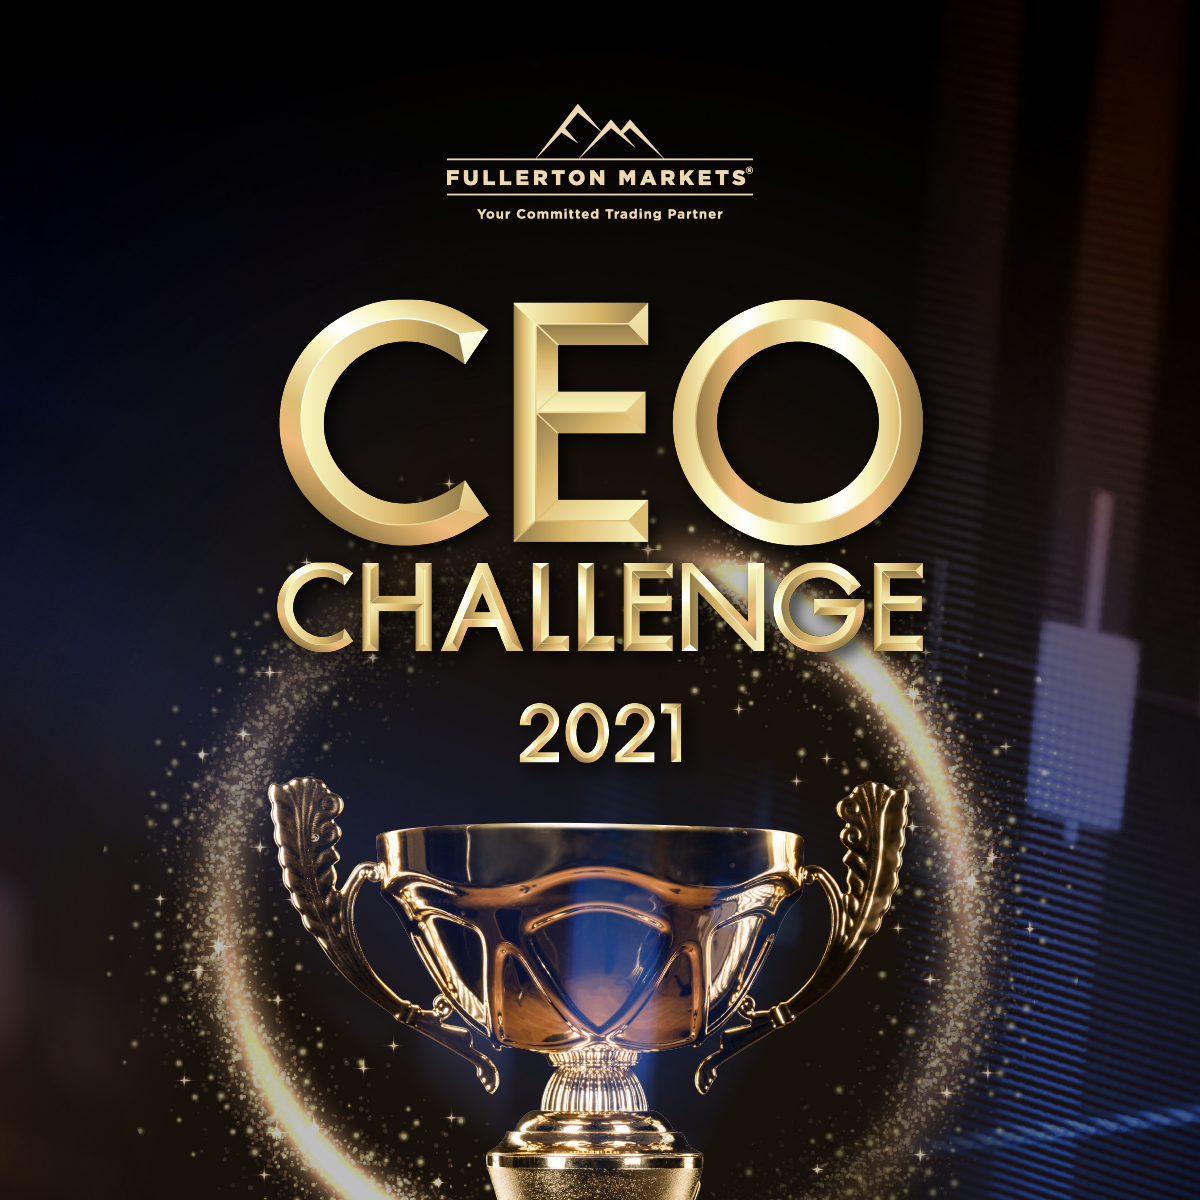 CEO-Challenge-2021